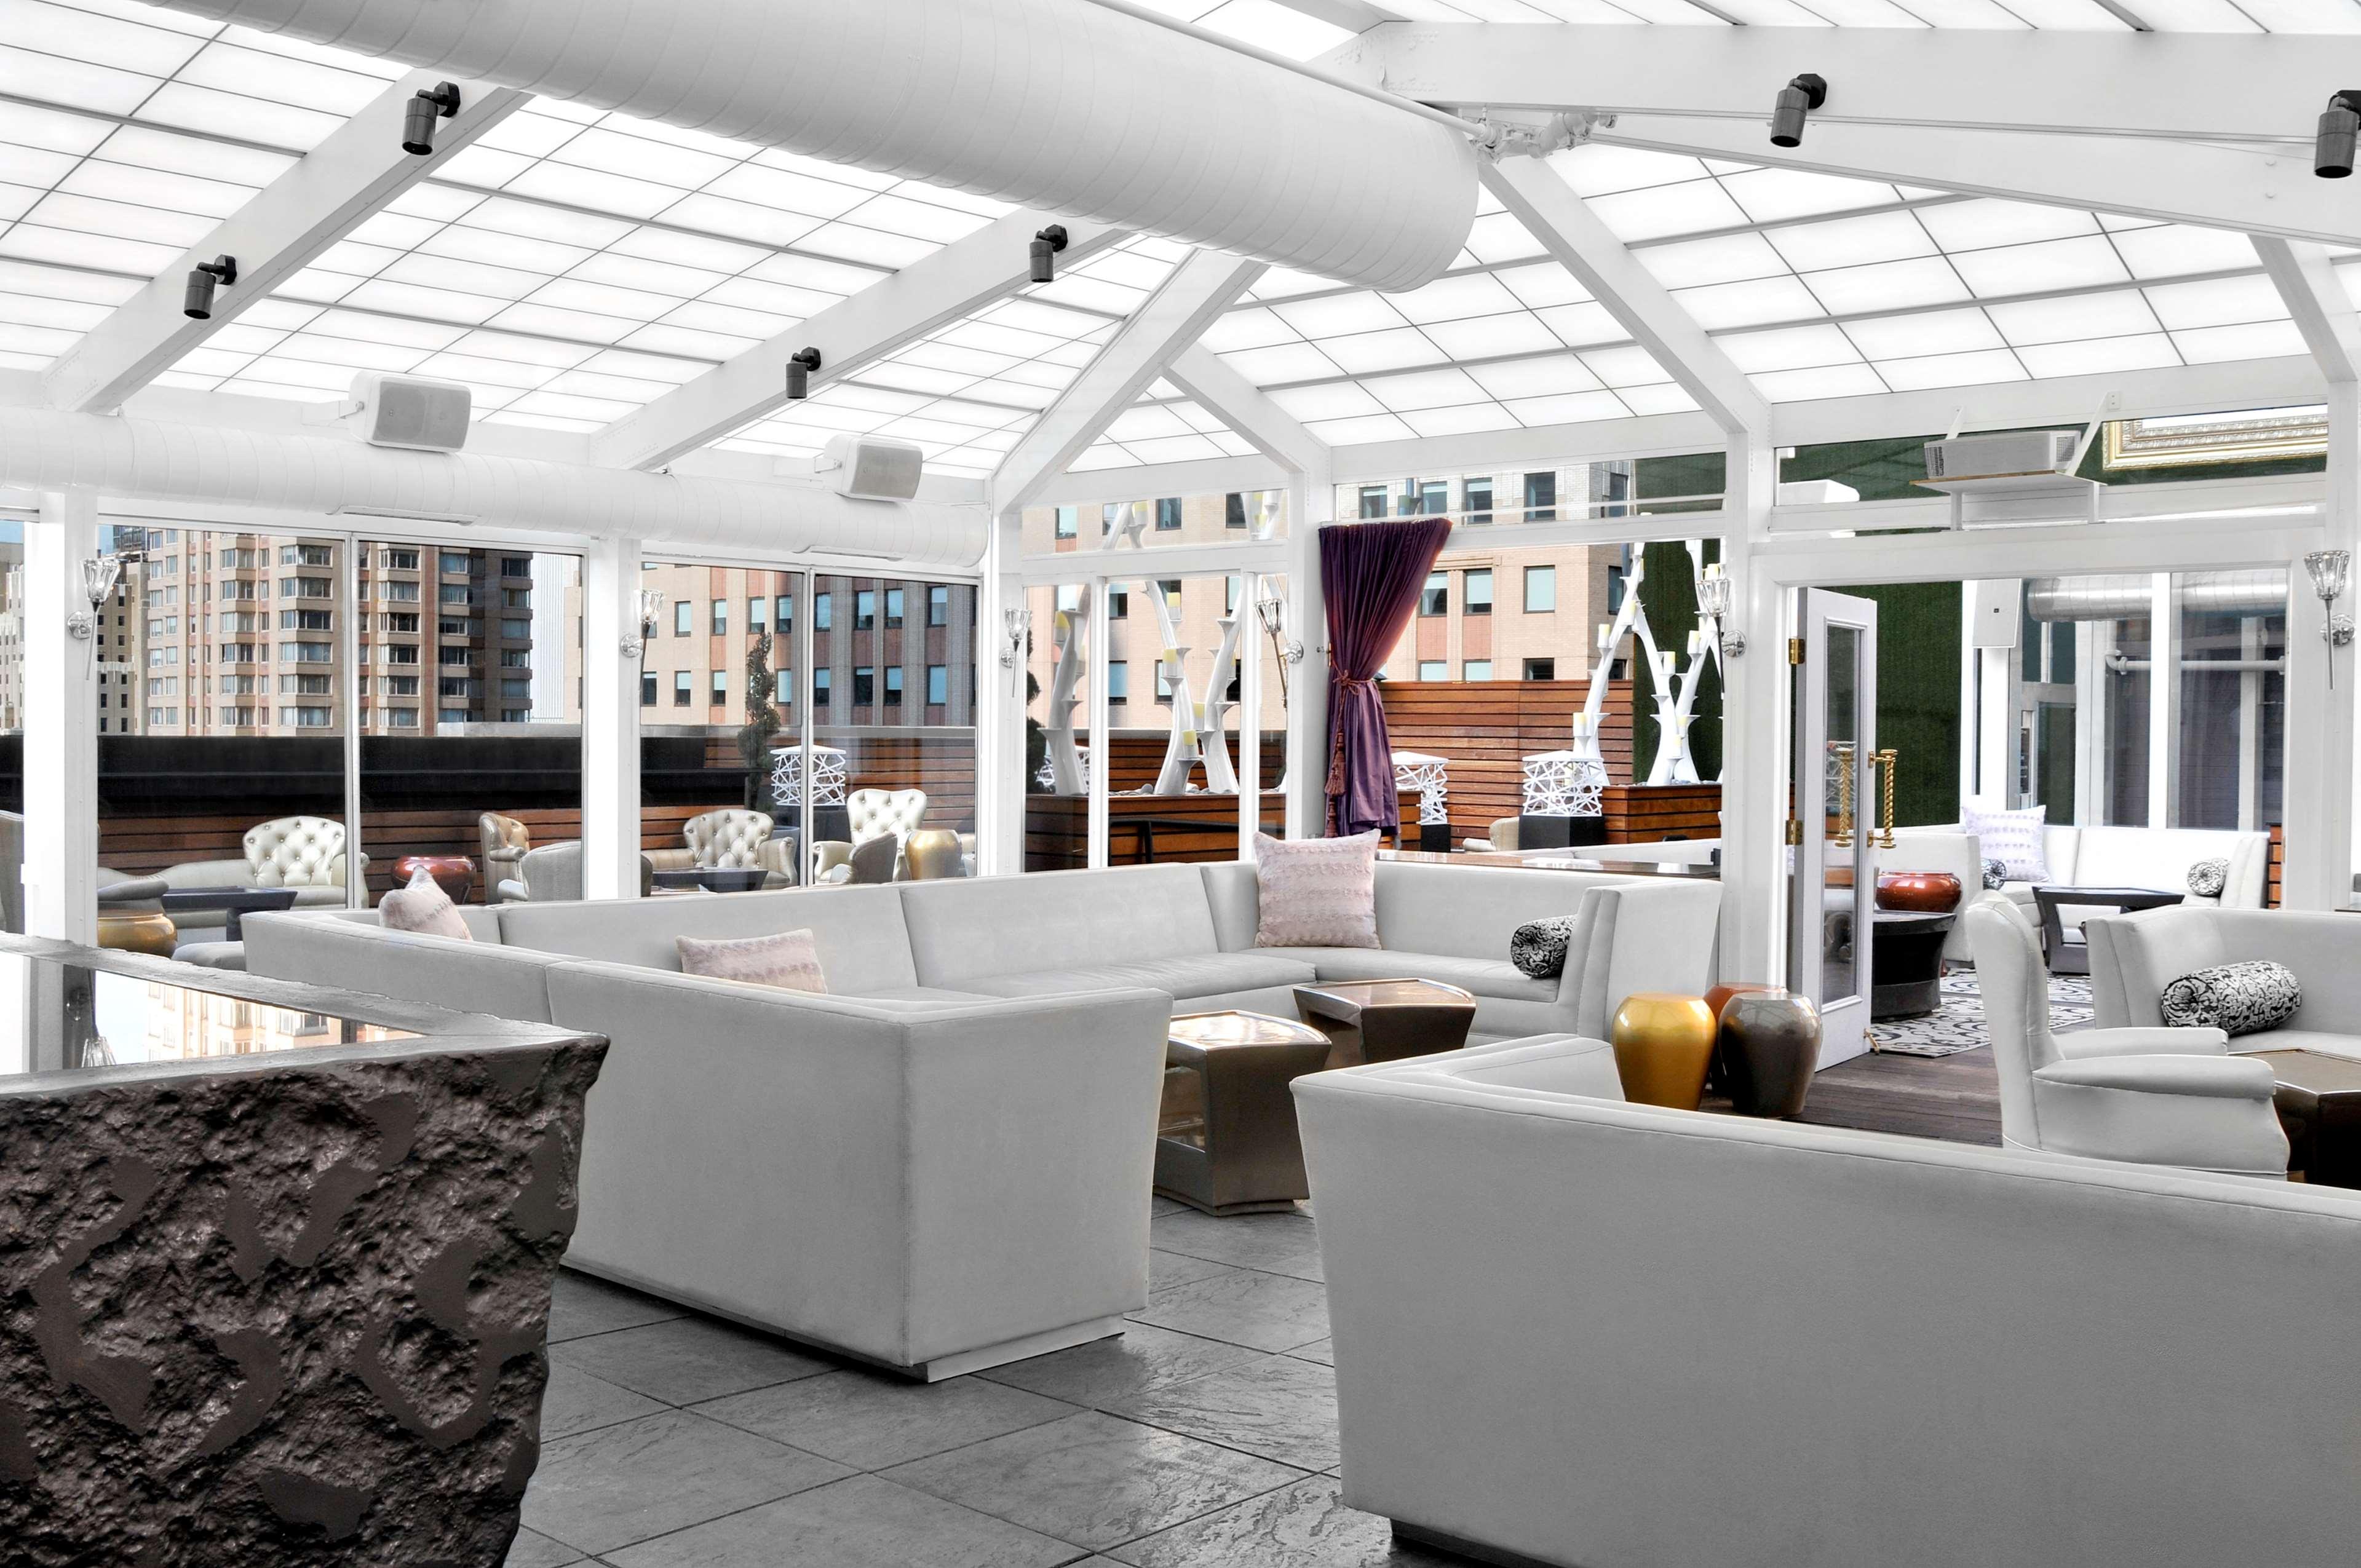 Hilton Garden Inn Times Square image 19